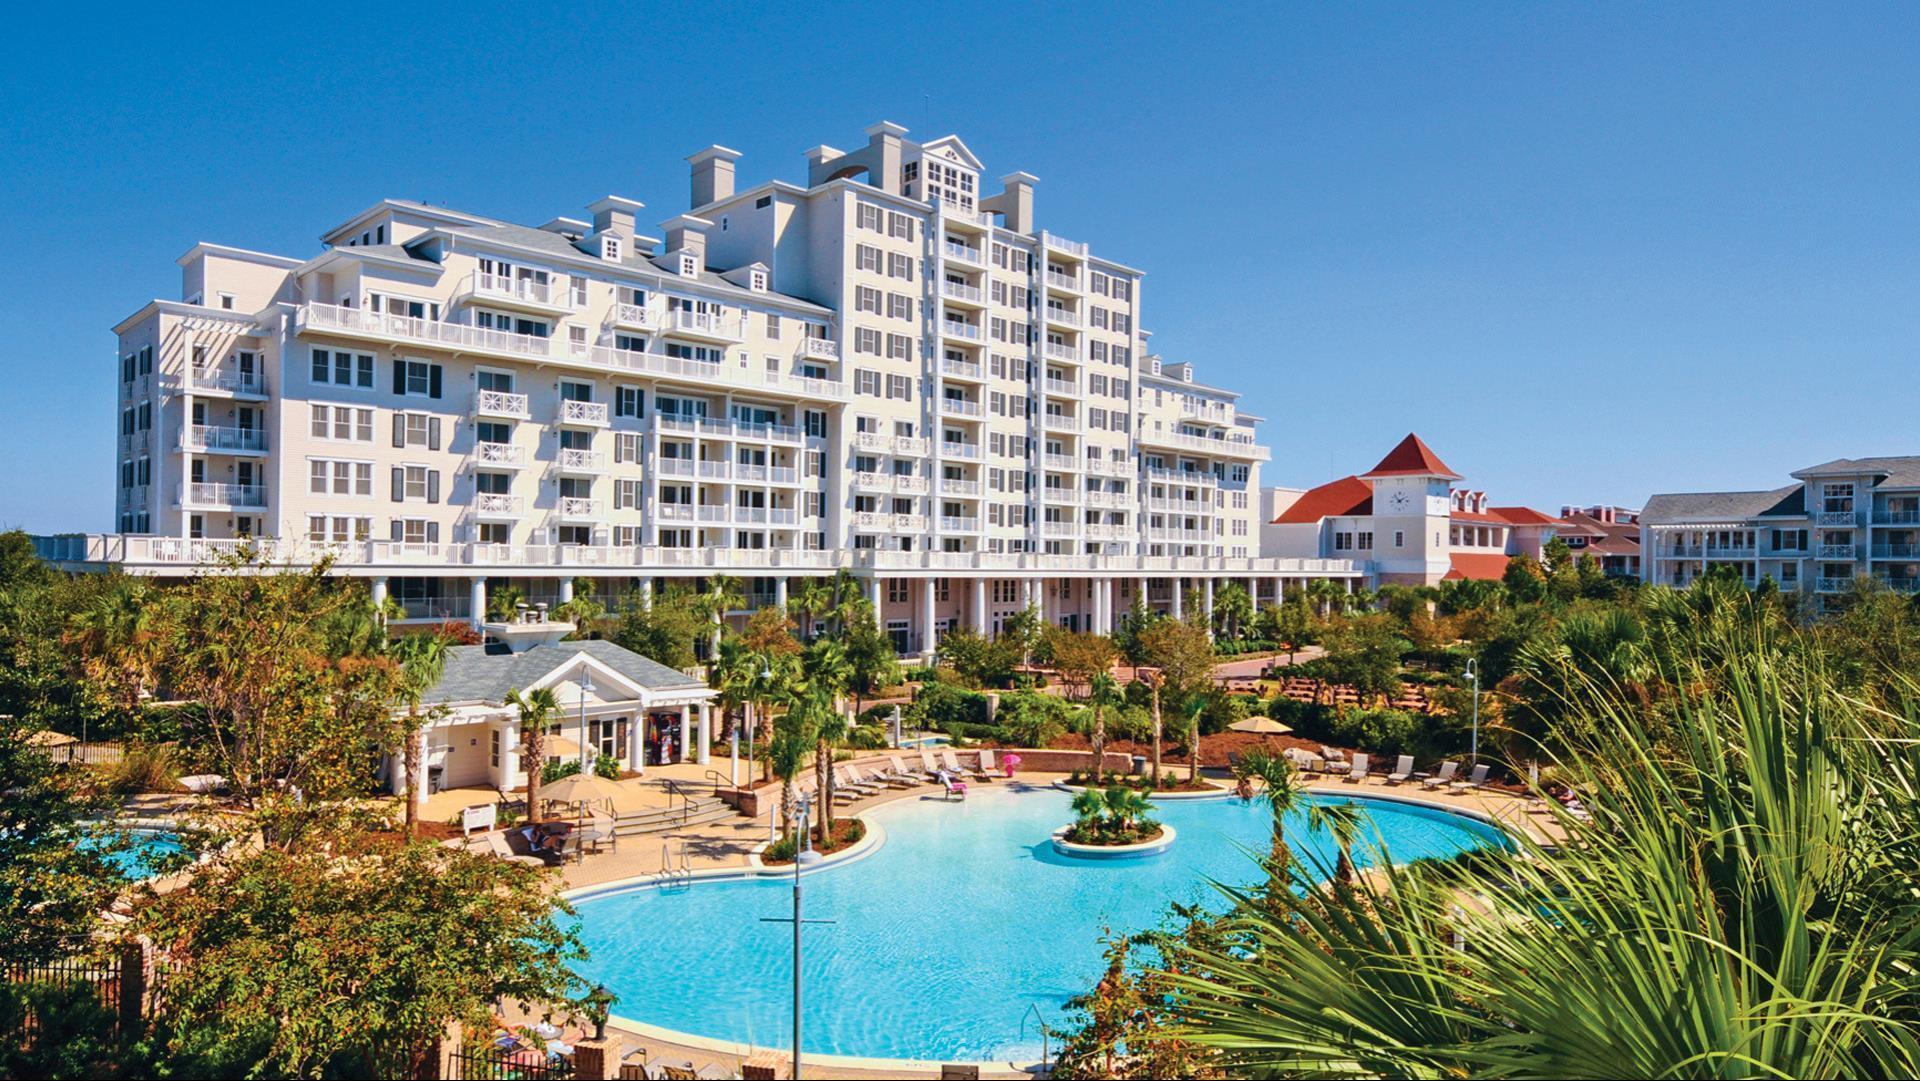 15+ Bayside inn sandestin golf and beach resort information